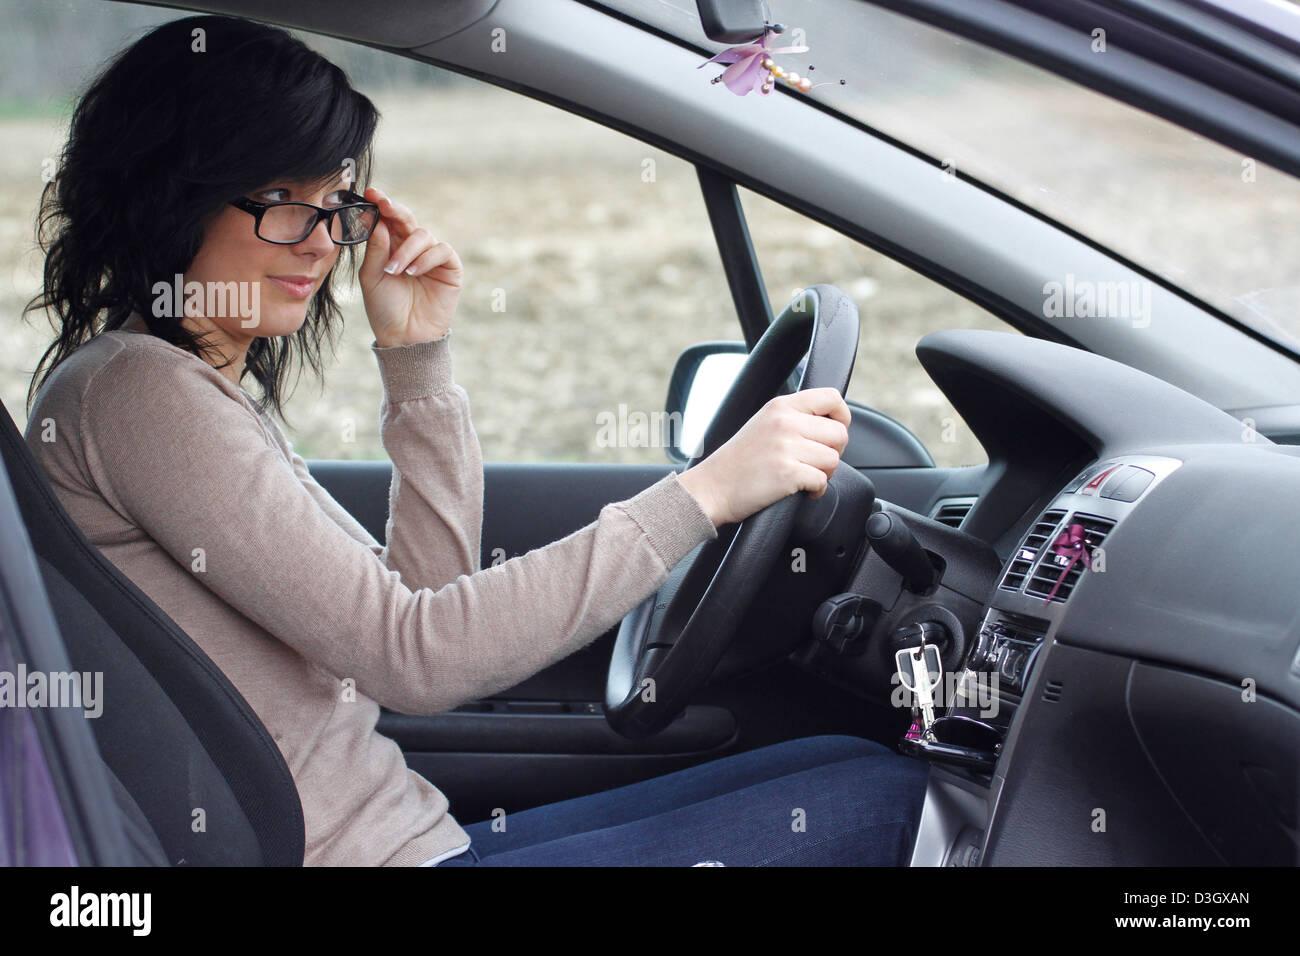 AUTOMOBIL-TREIBER Stockbild